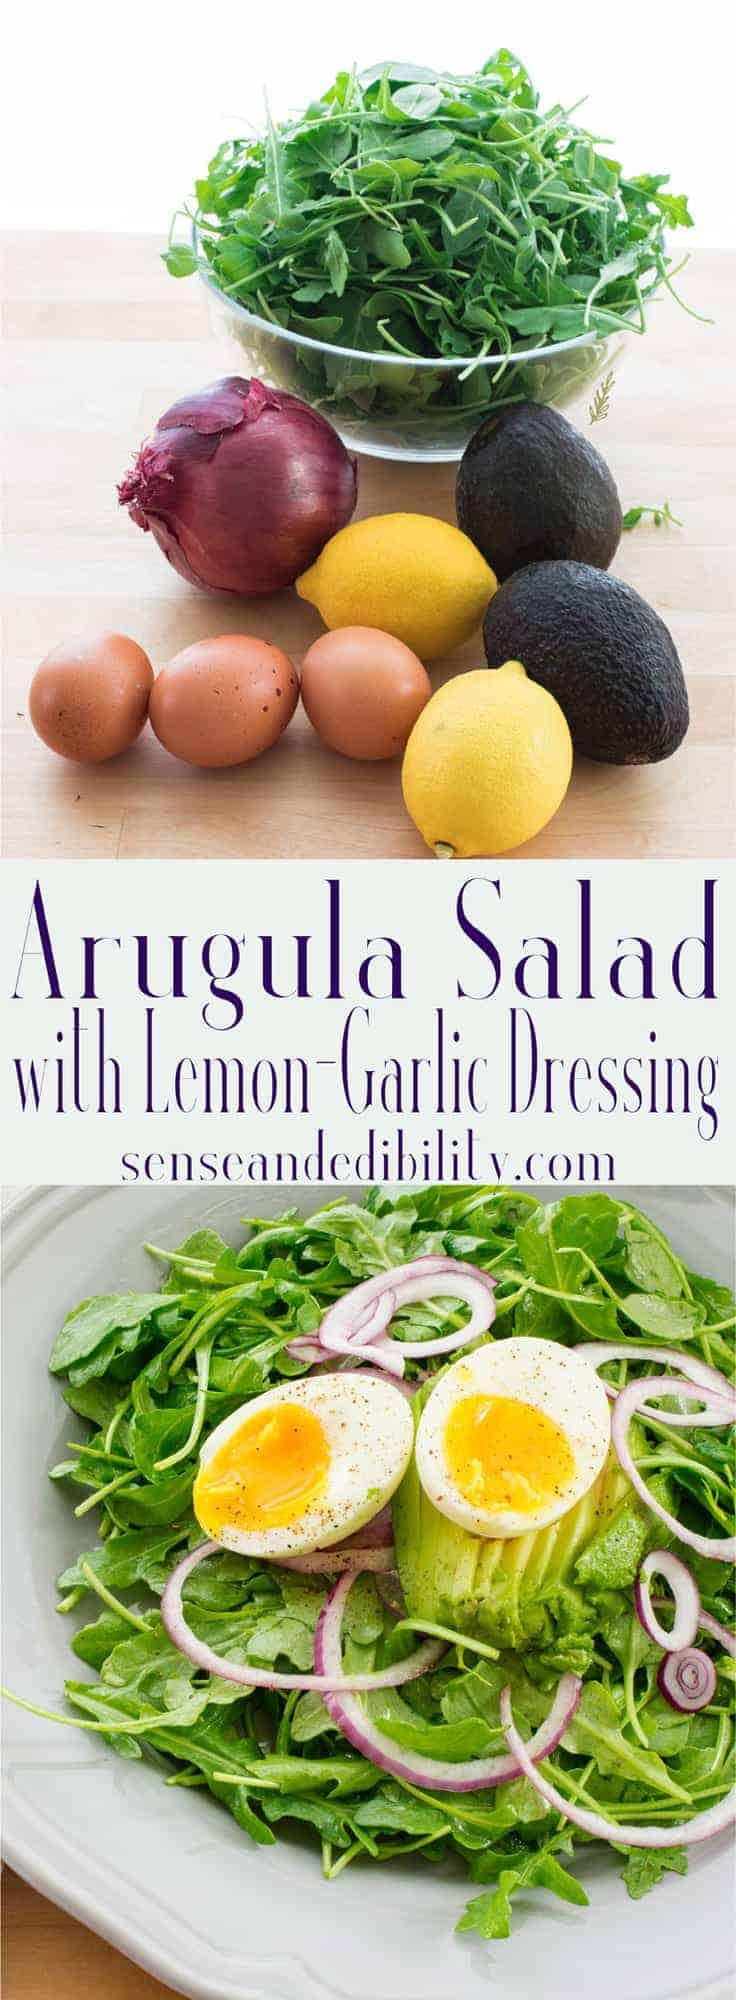 Sense & Edibility's Arugula Salad with Lemon-Garlic Dressing Pin